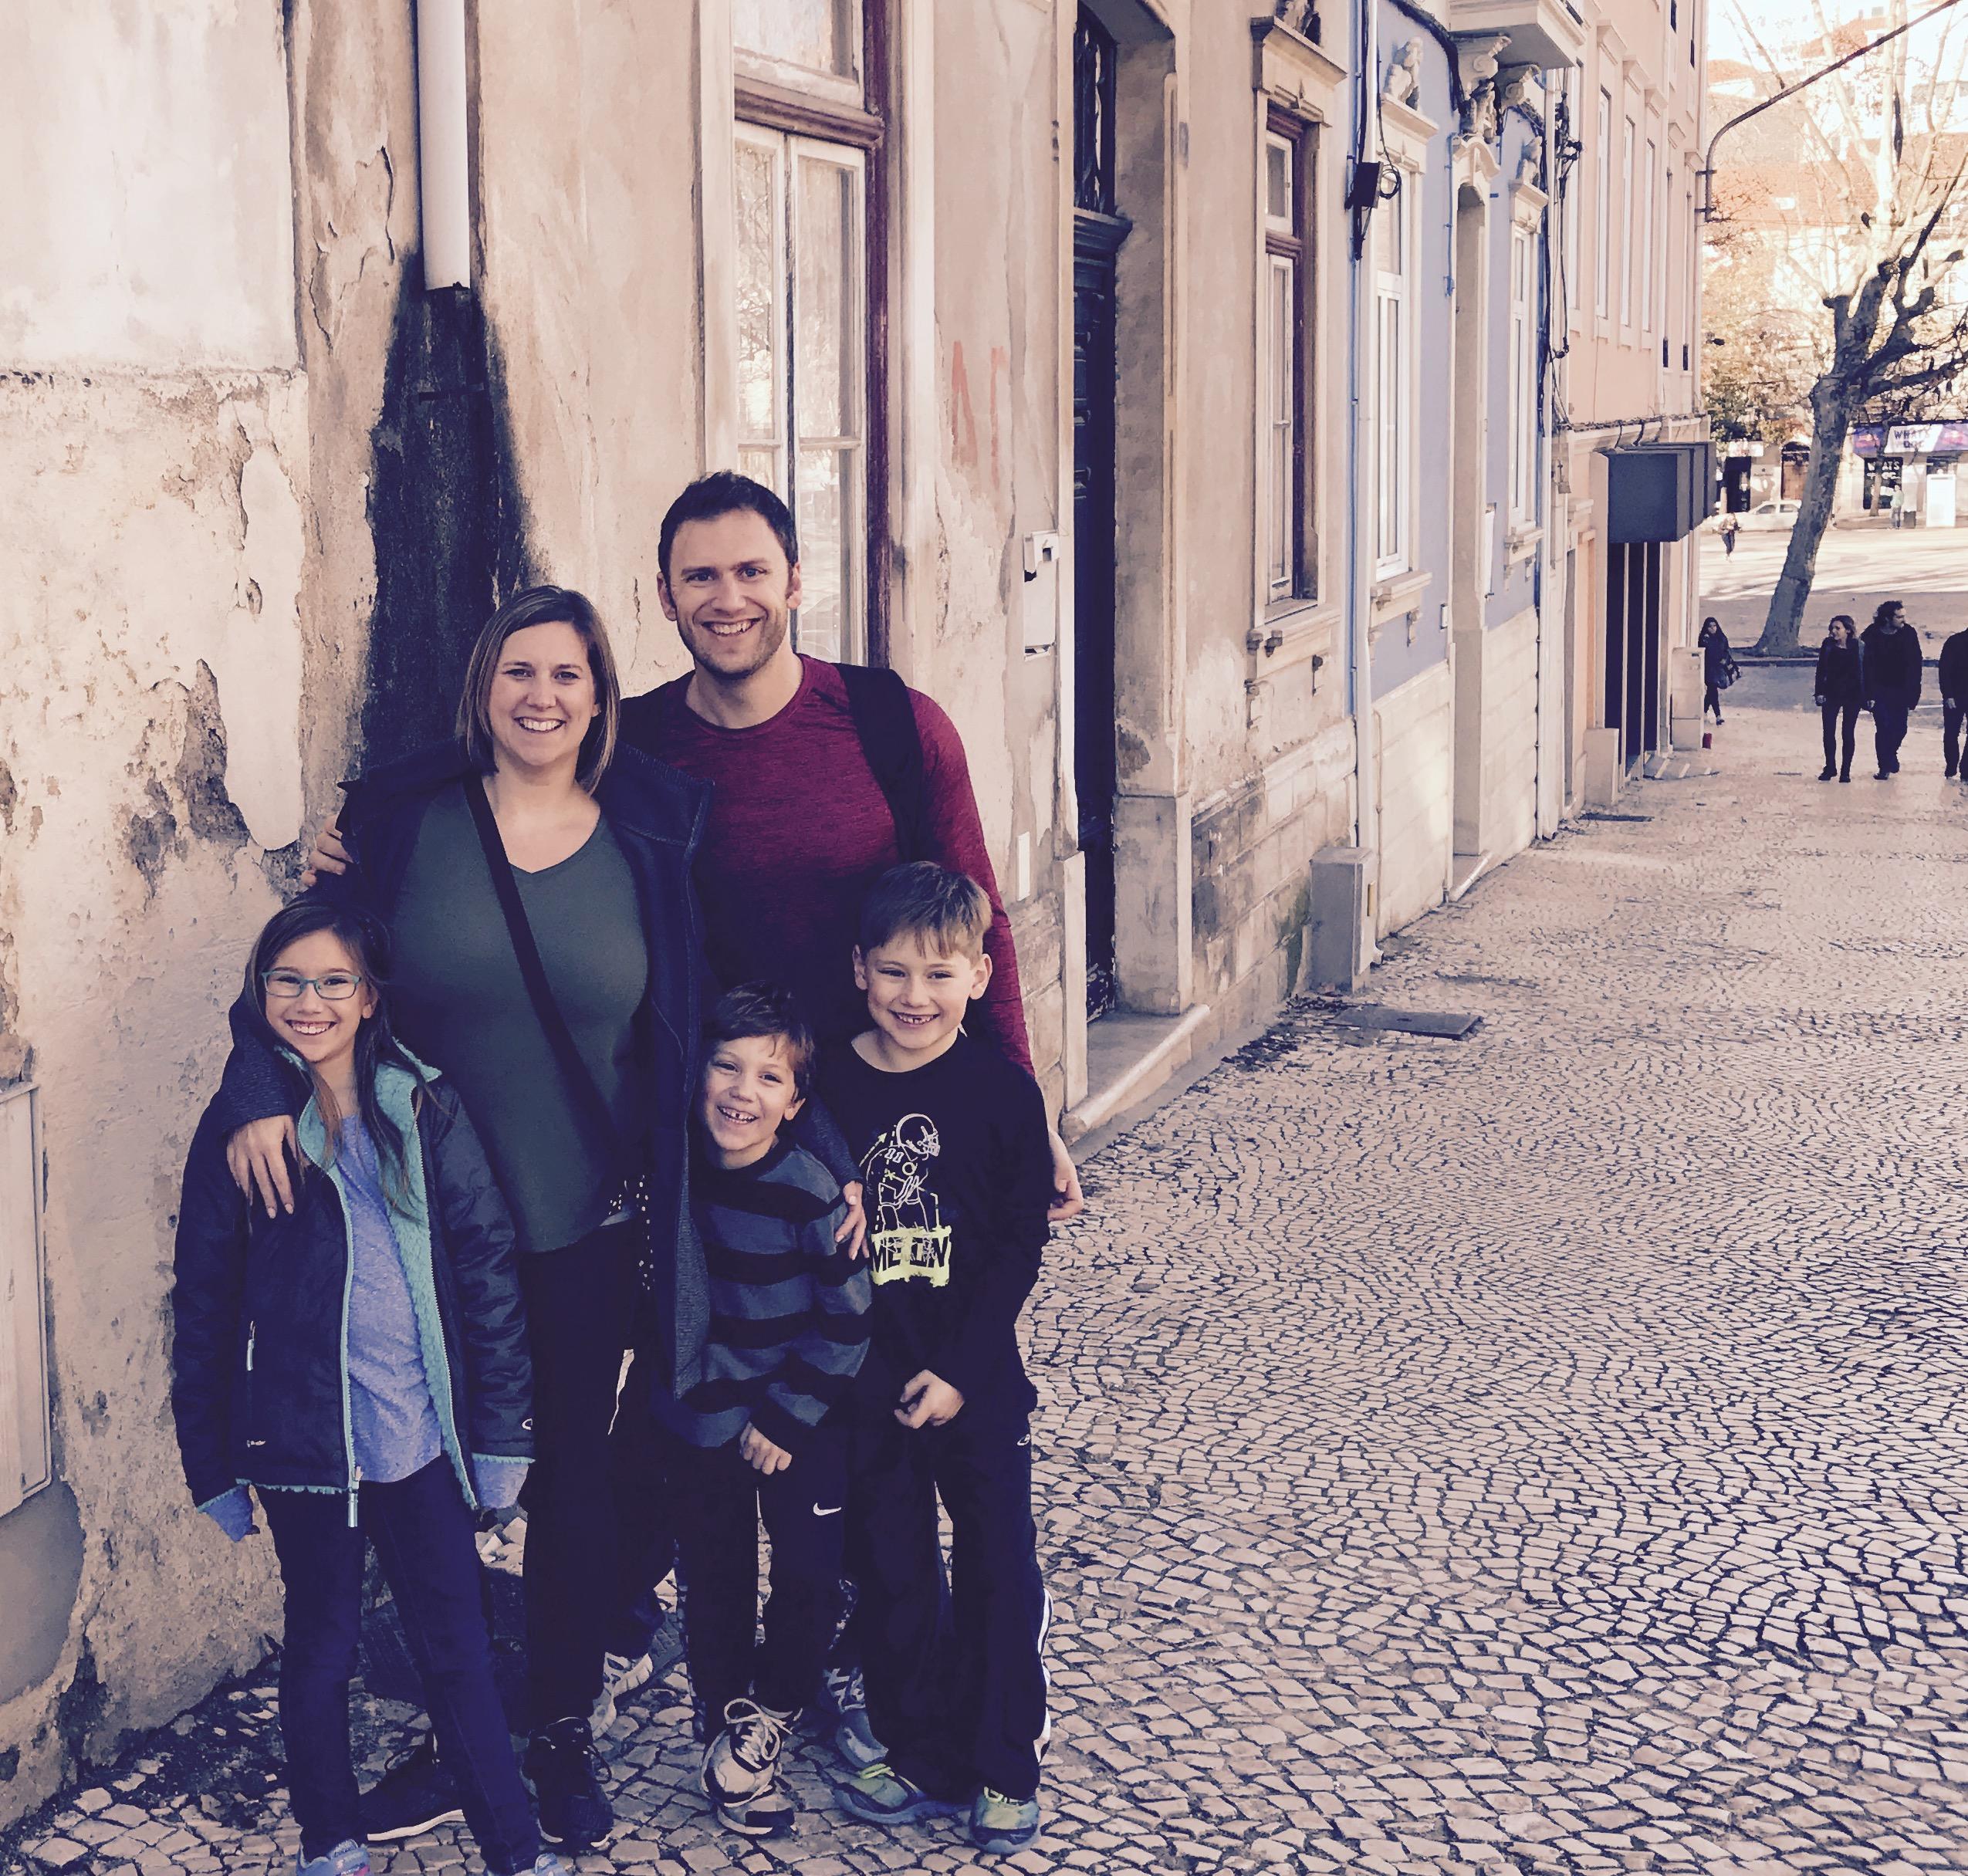 Barlow Family - Family Passport